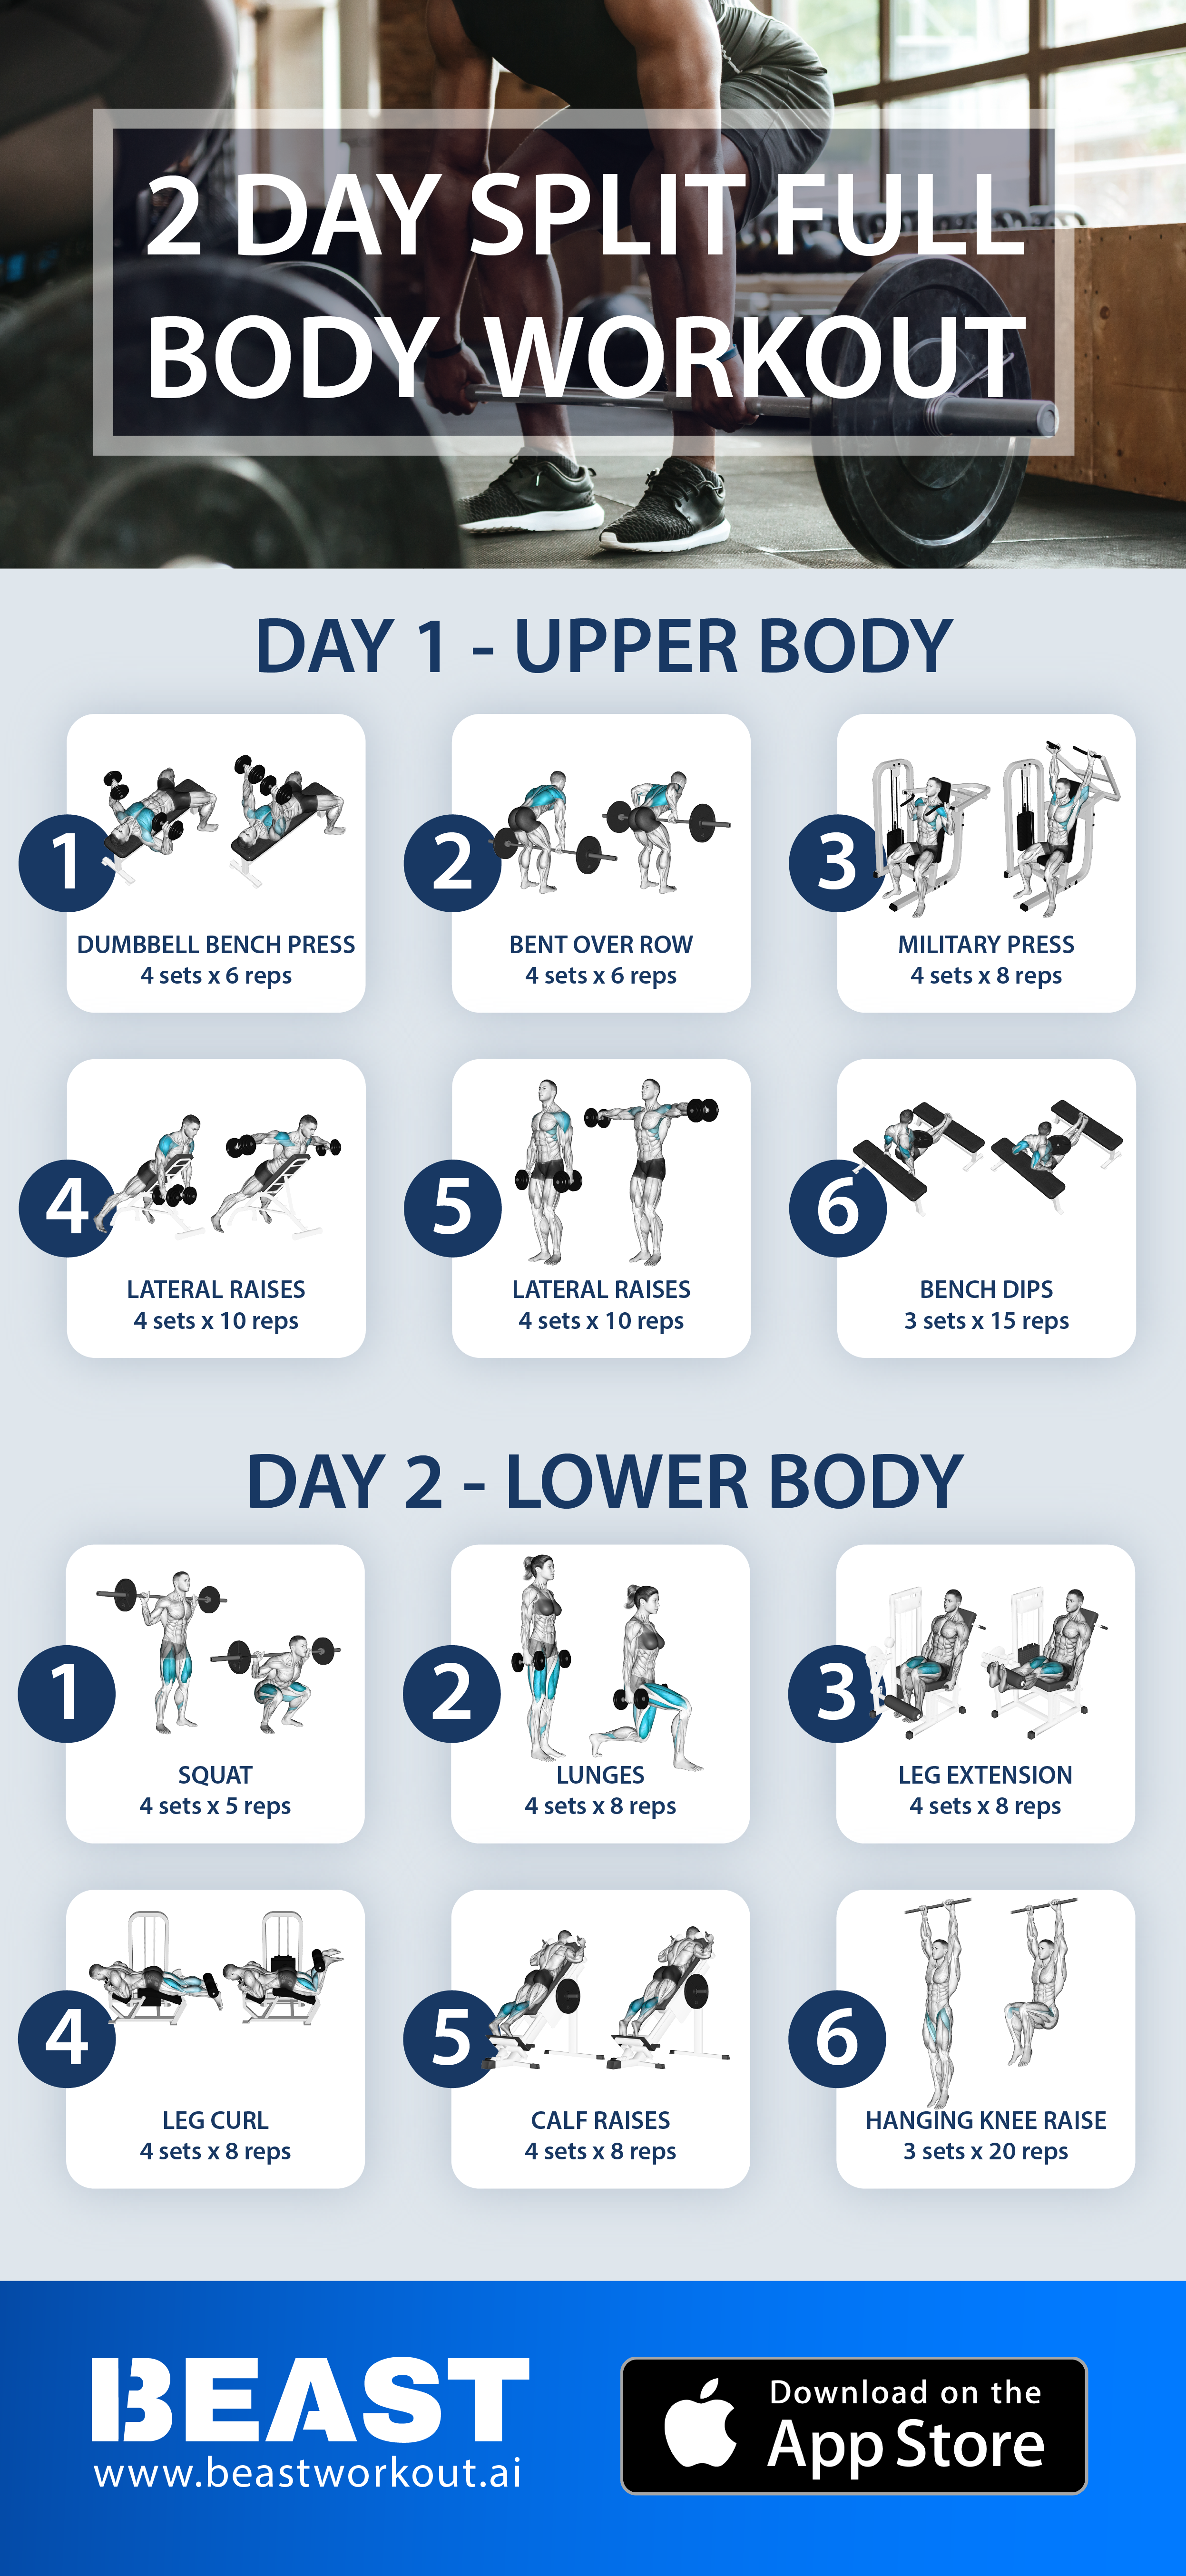 Essential Full Body Workout 2 Day Split Full Body Workout Routine Best Full Body Workout Full Body Workout Program